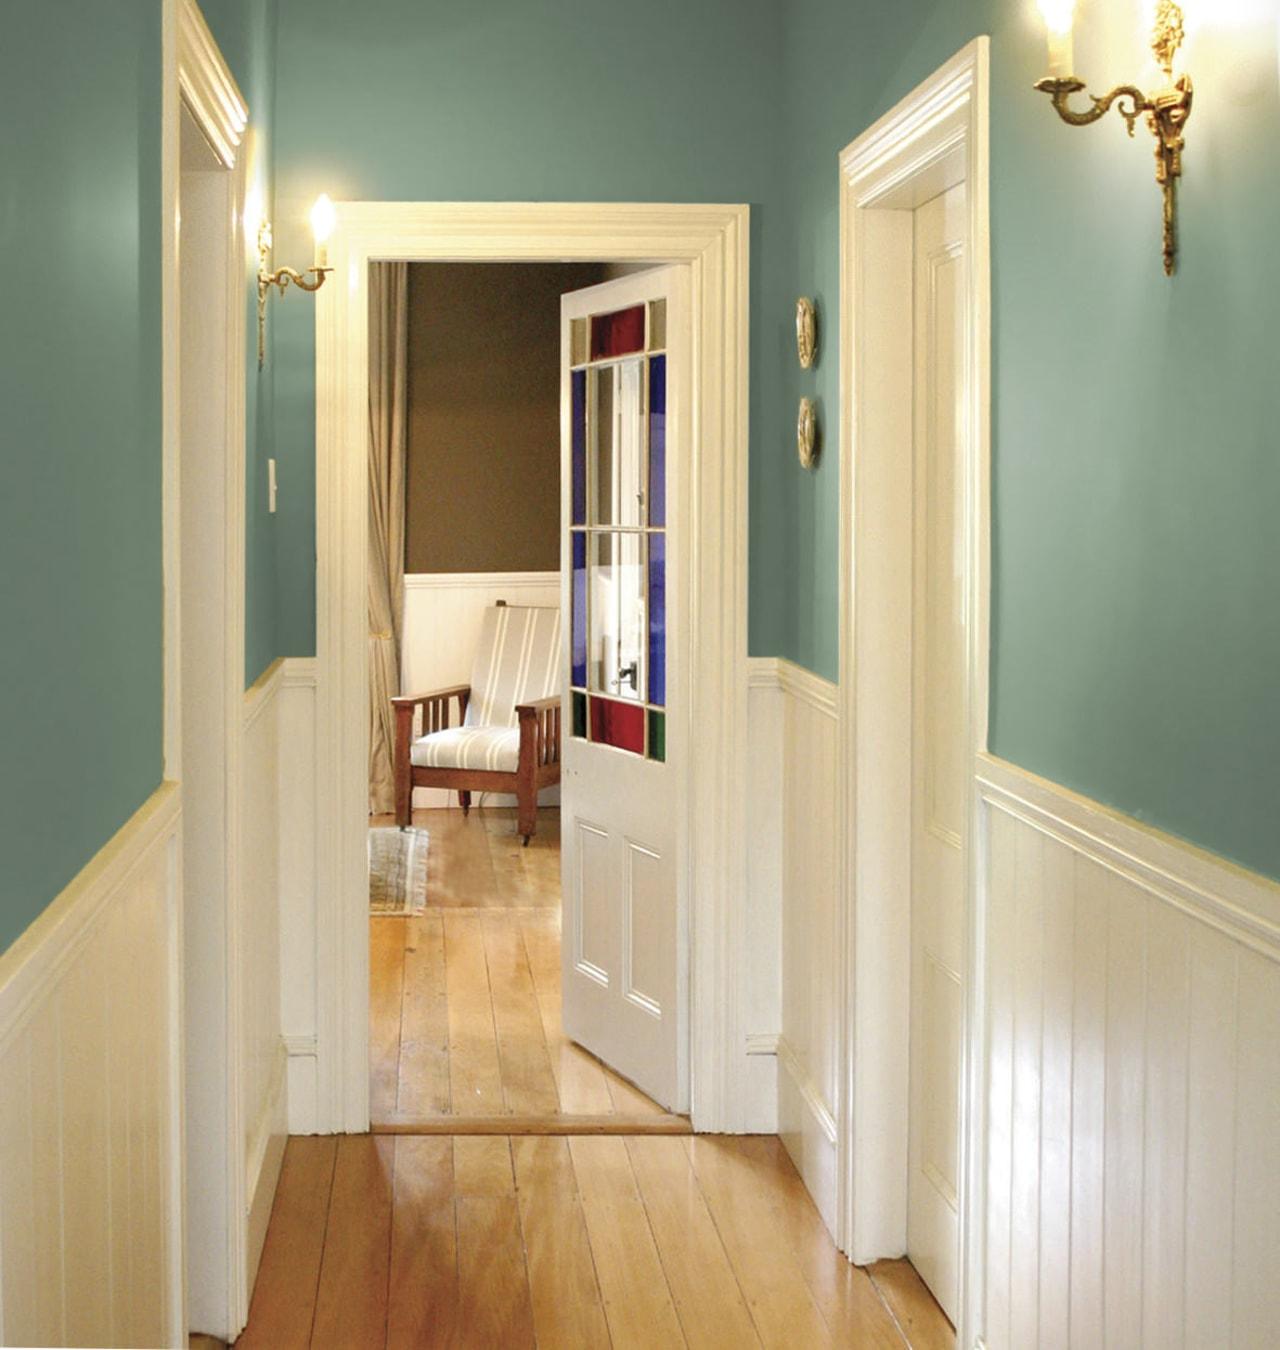 Country lodge painted in Resene shades hallway in ceiling, door, floor, flooring, hall, hardwood, home, house, interior design, laminate flooring, lighting, molding, property, real estate, room, wall, window, wood, wood flooring, wood stain, orange, green